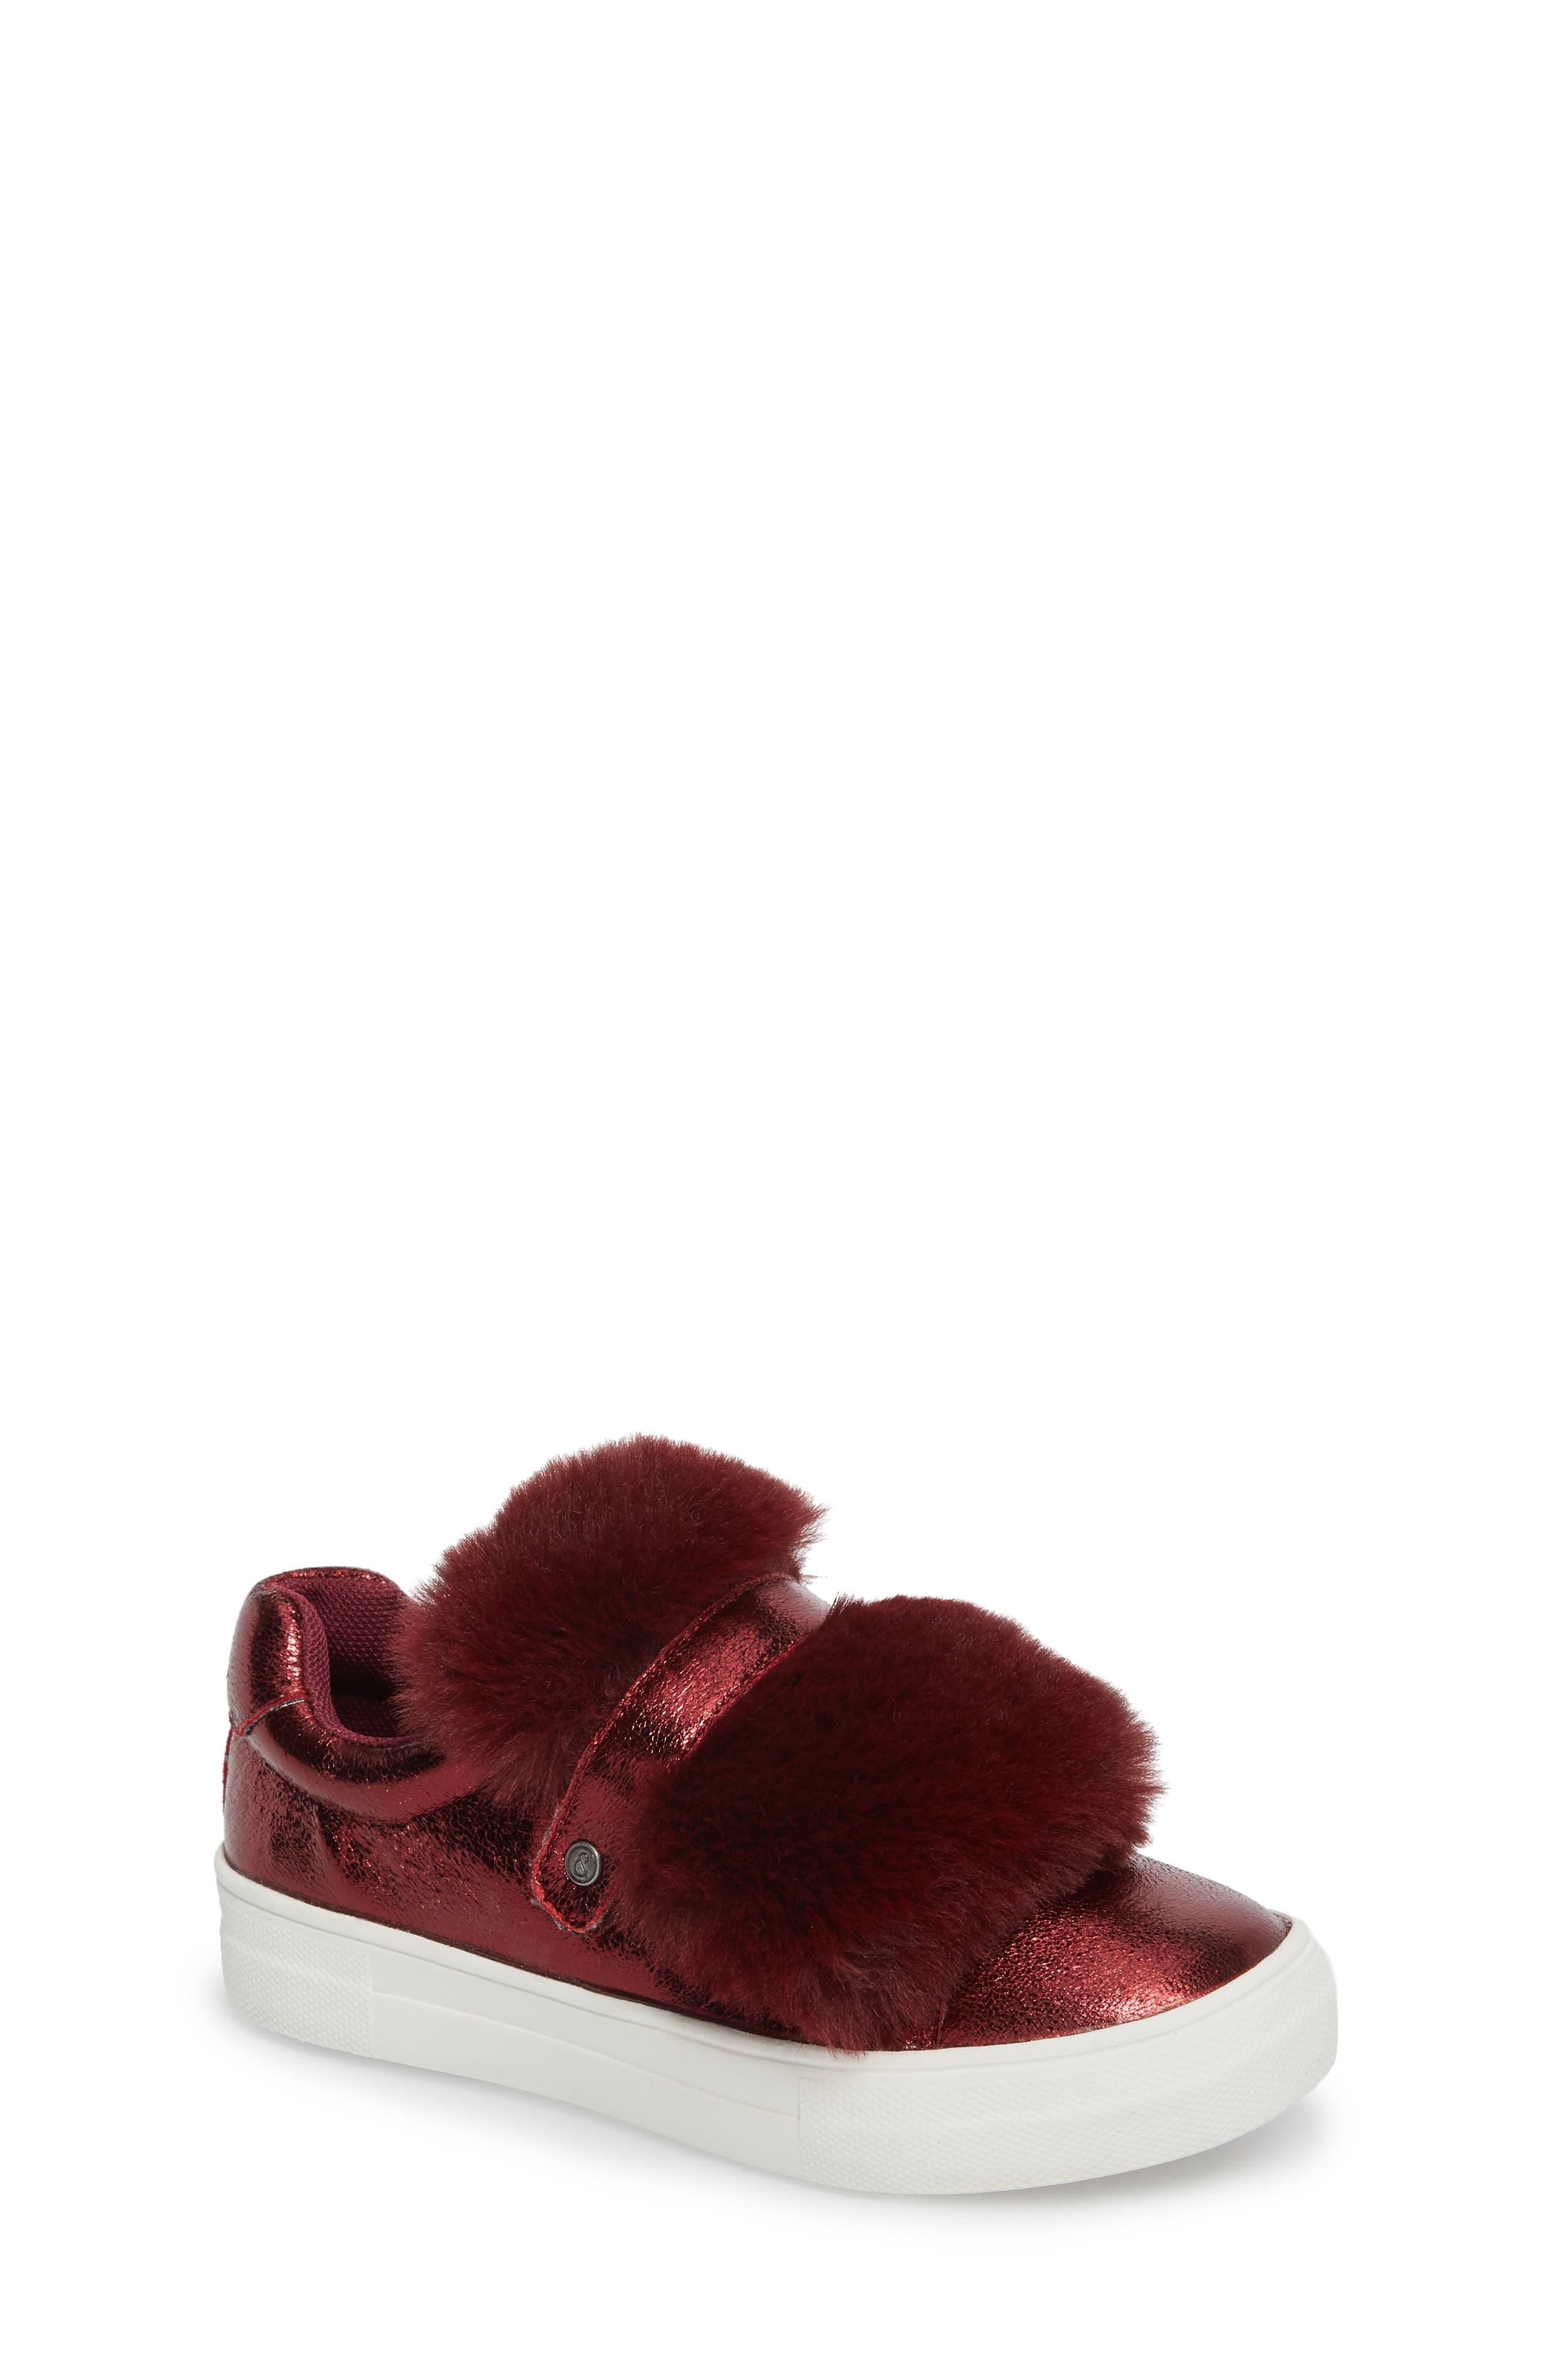 Zandra Faux Fur Metallic Sneaker,                             Main thumbnail 1, color,                             930